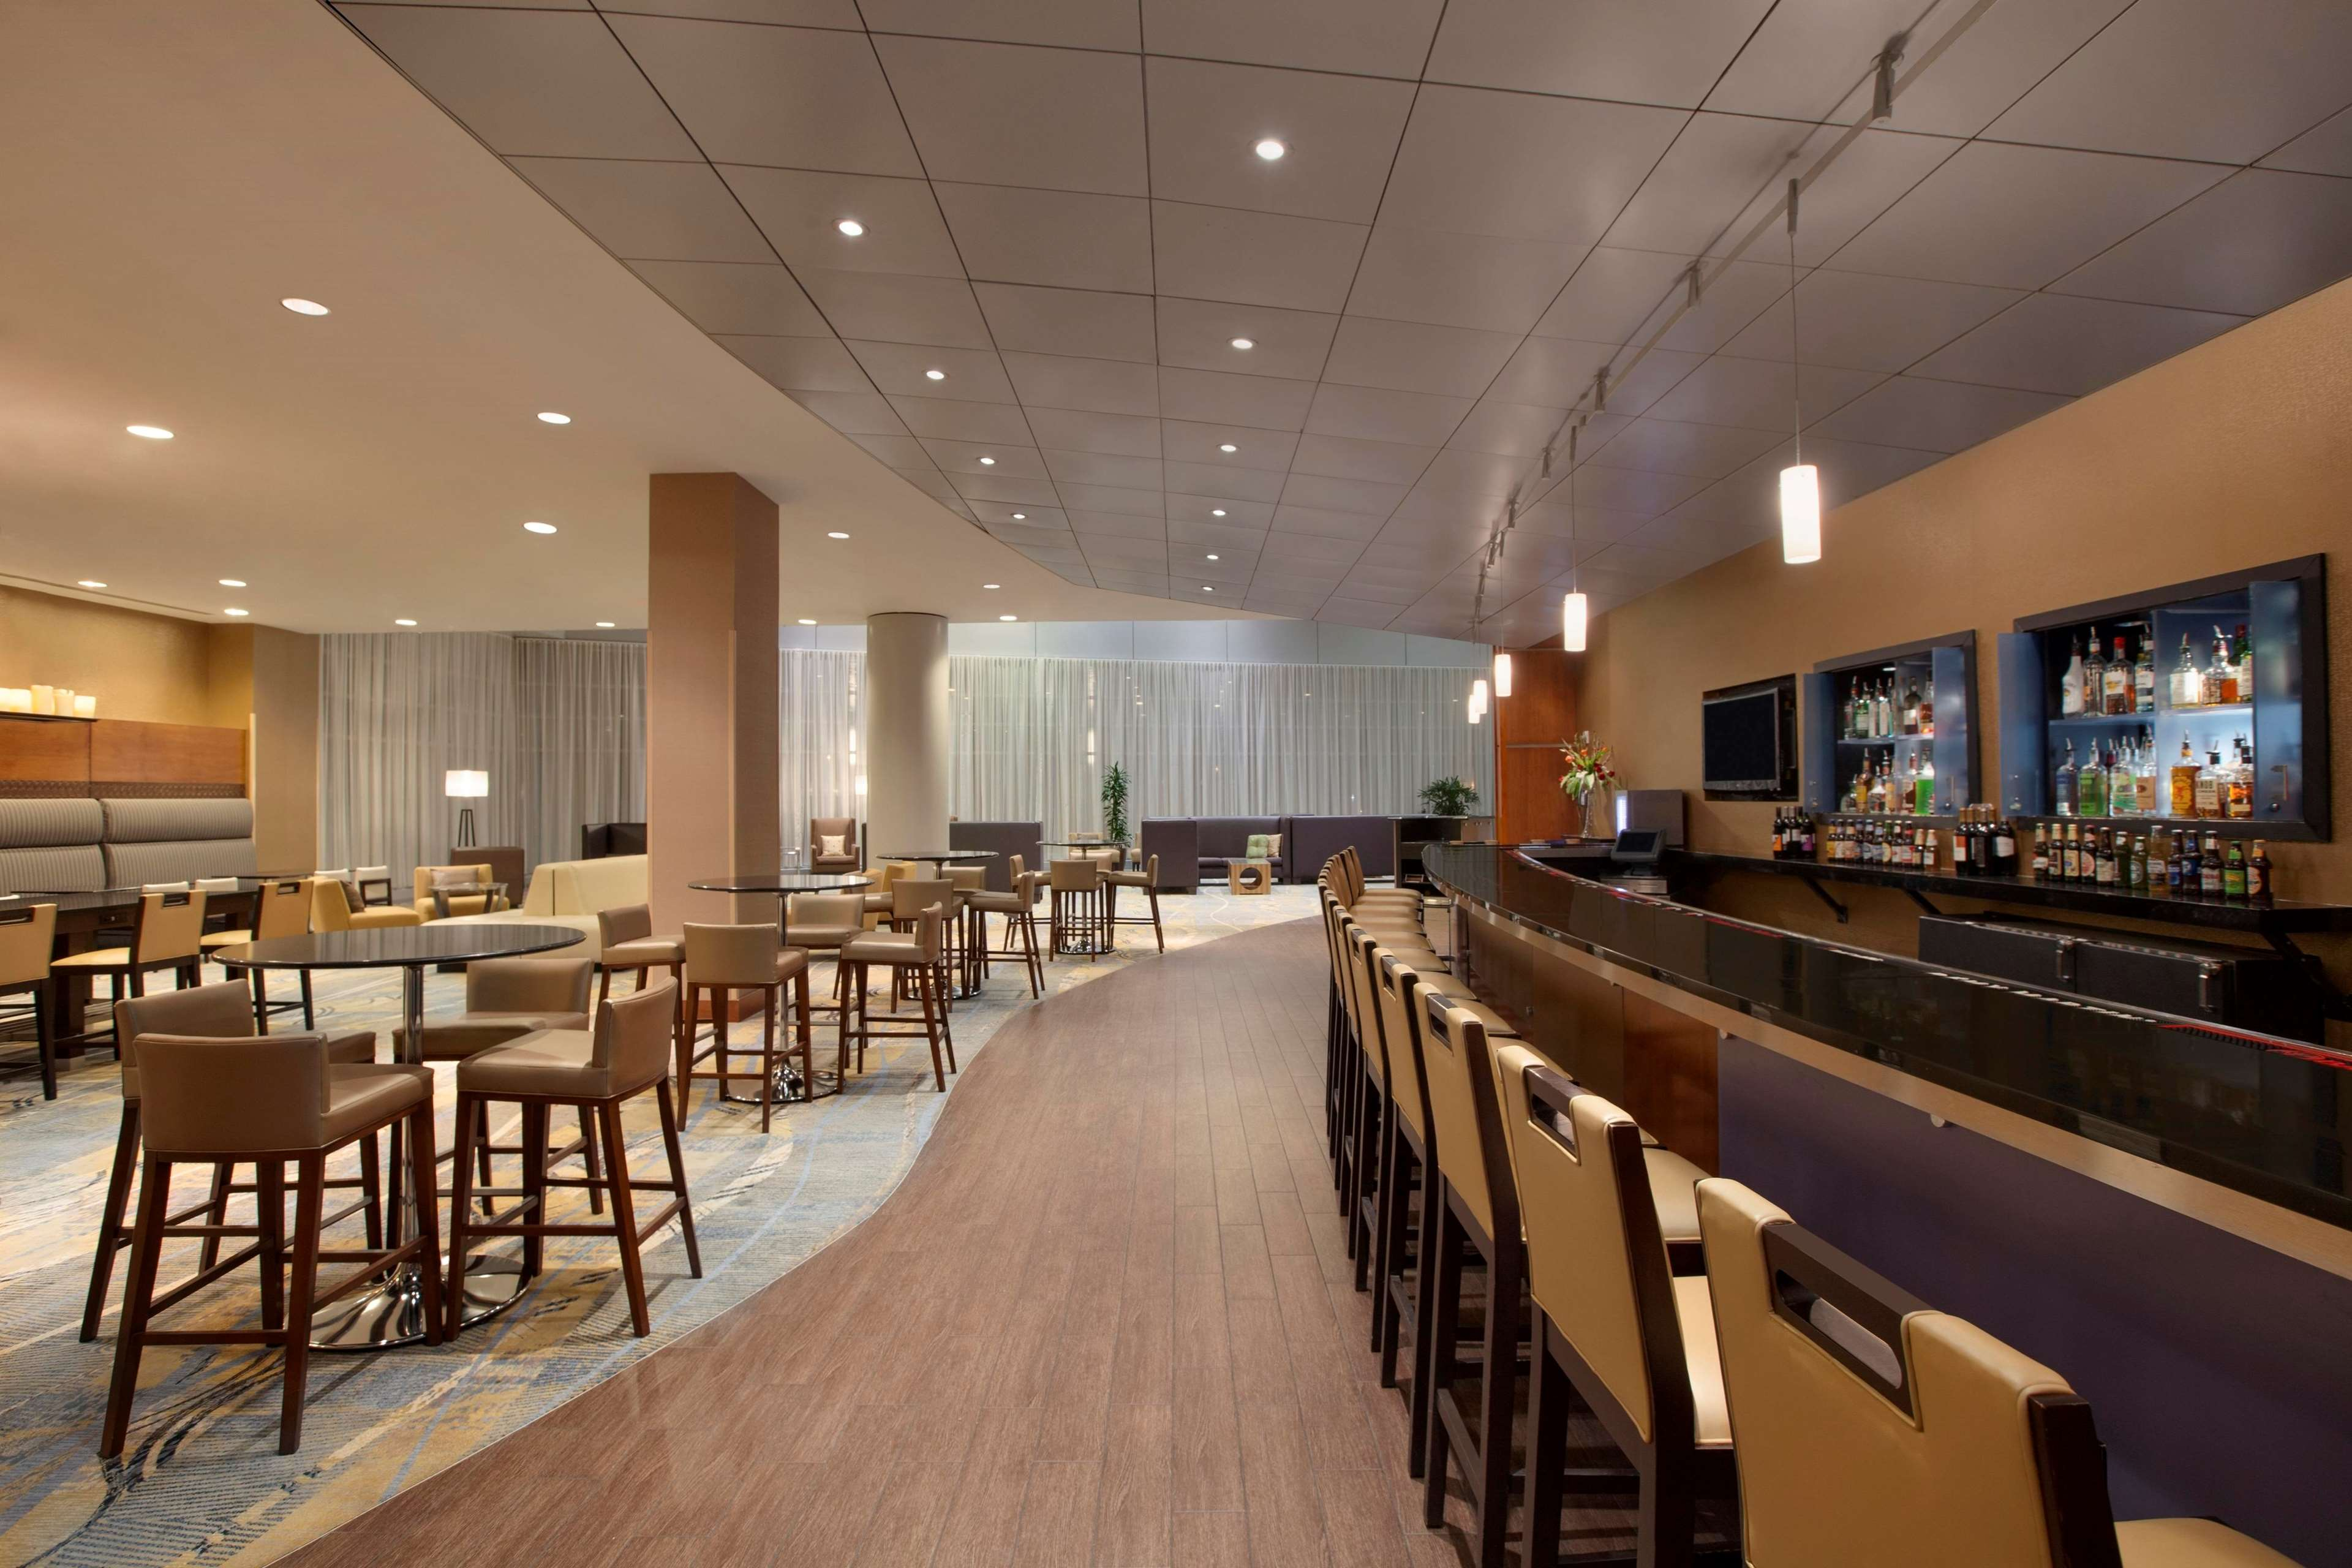 Hilton Baltimore BWI Airport image 5